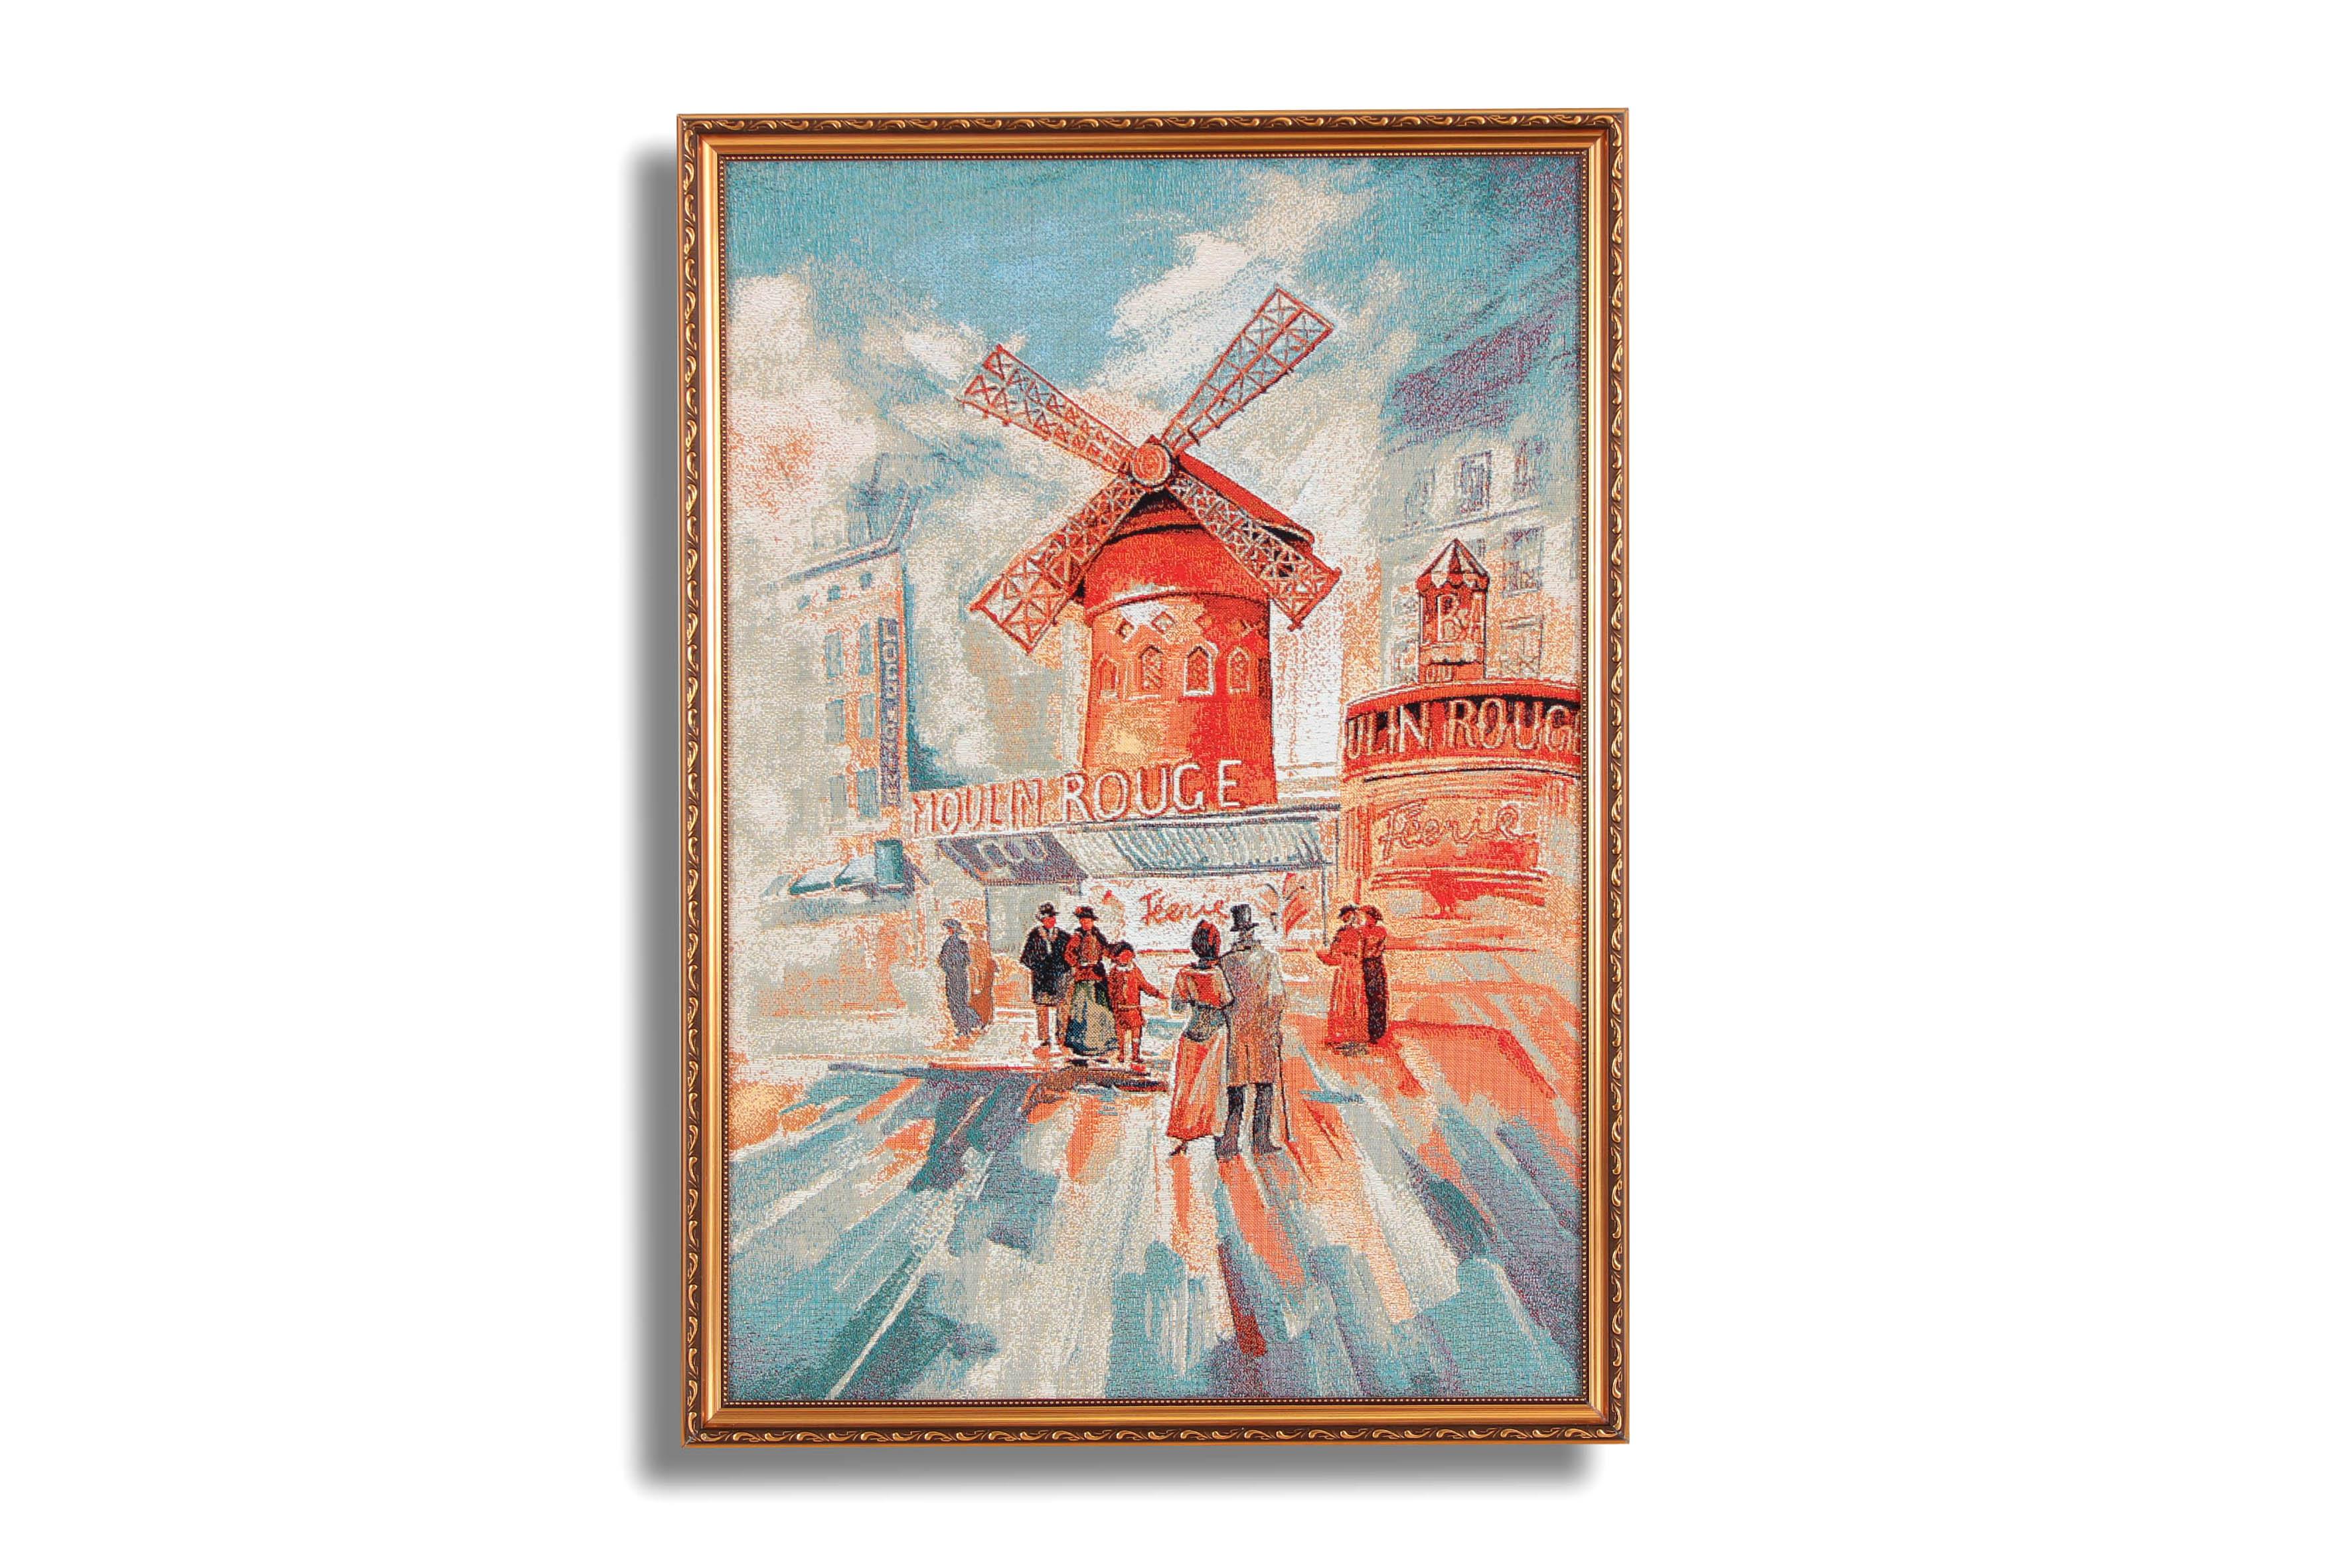 цены Картина Магазин гобеленов бульвар мулен руж 49*69 см., Гобелен